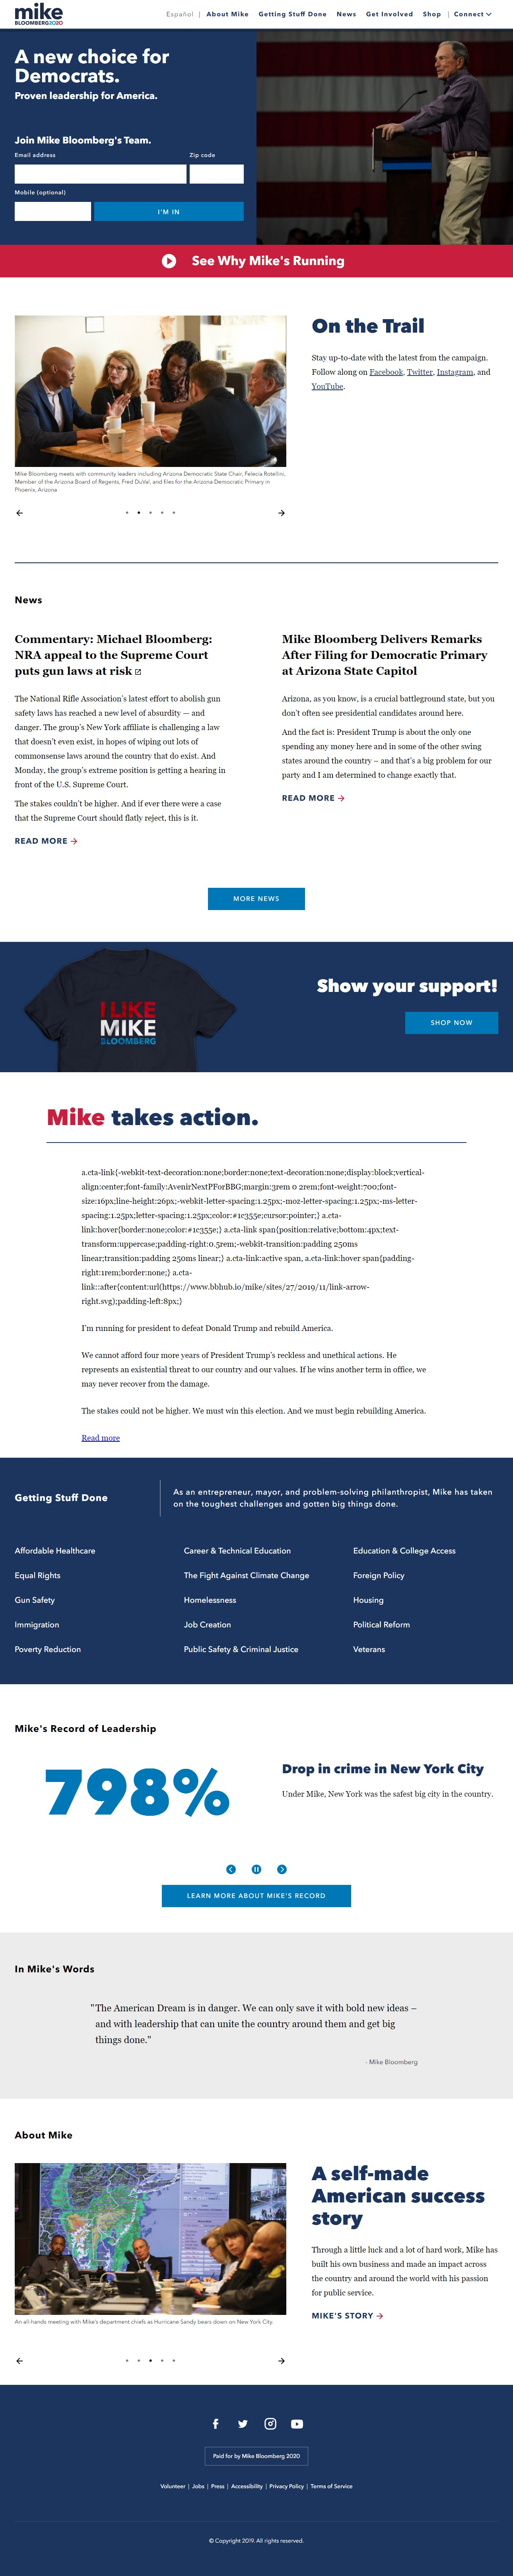 Homepage Snapshot for December 1, 2019: Former Mayor Michael Bloomberg